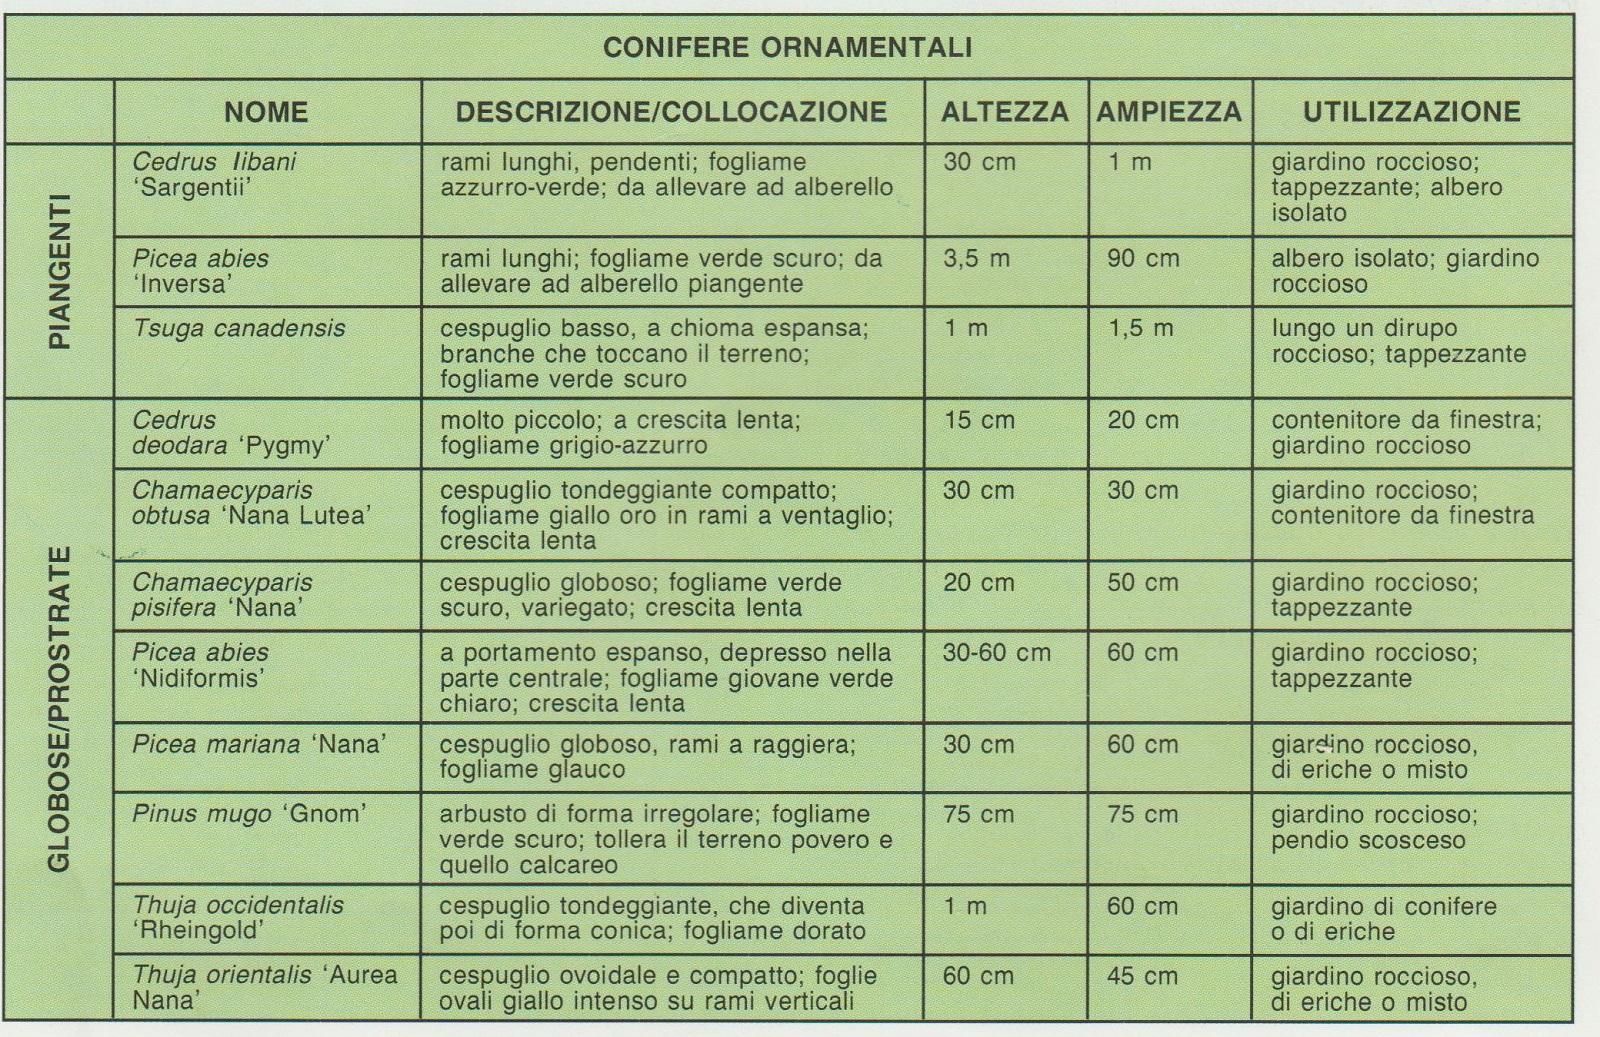 http://www.energialternativa.info/public/newforum/ForumEA/H/Immagine%20(74)c.jpg